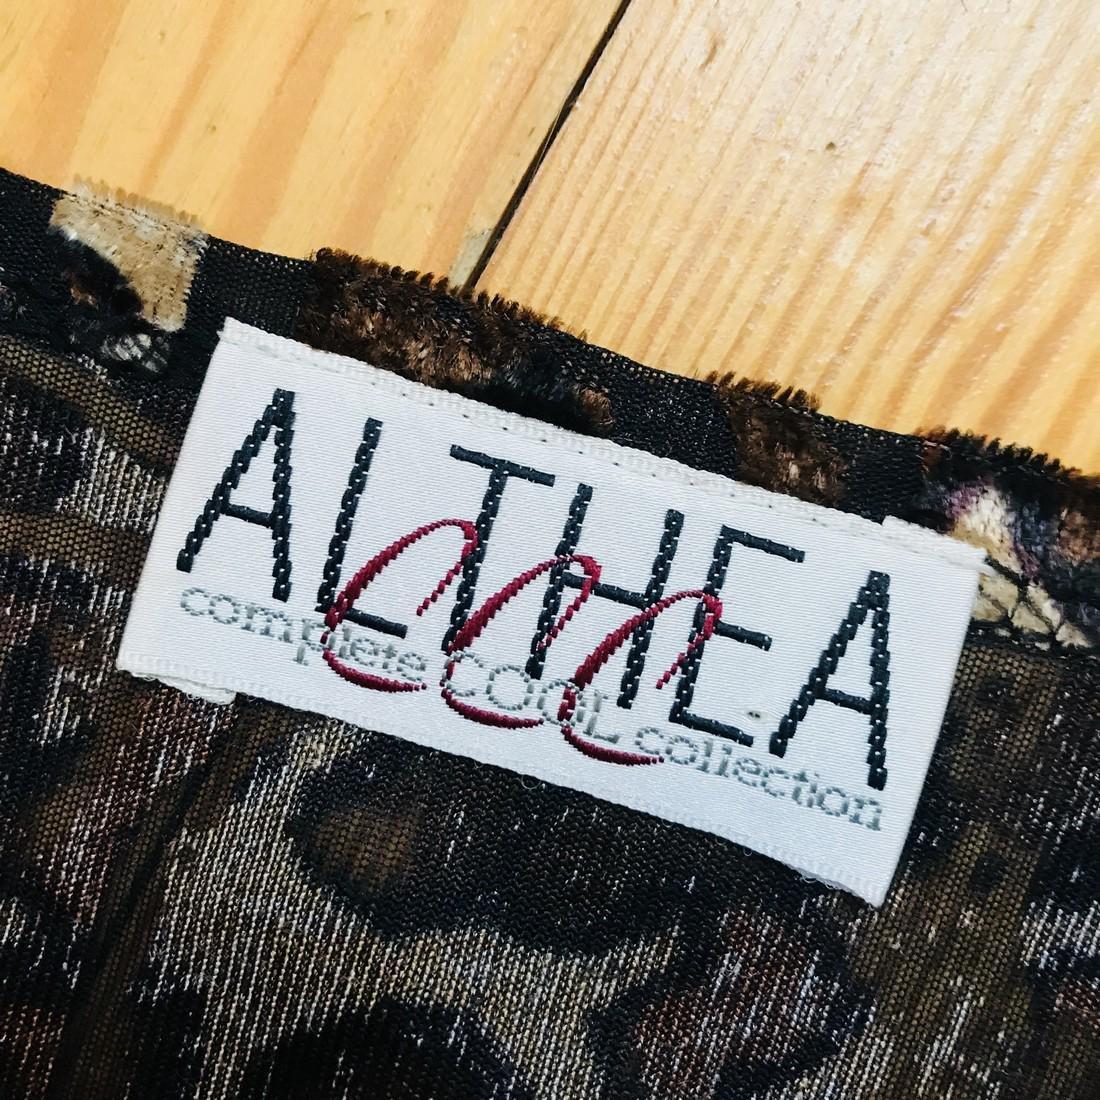 Vintage Women's Althea Designer Dress Size EUR 40 US 10 - 5